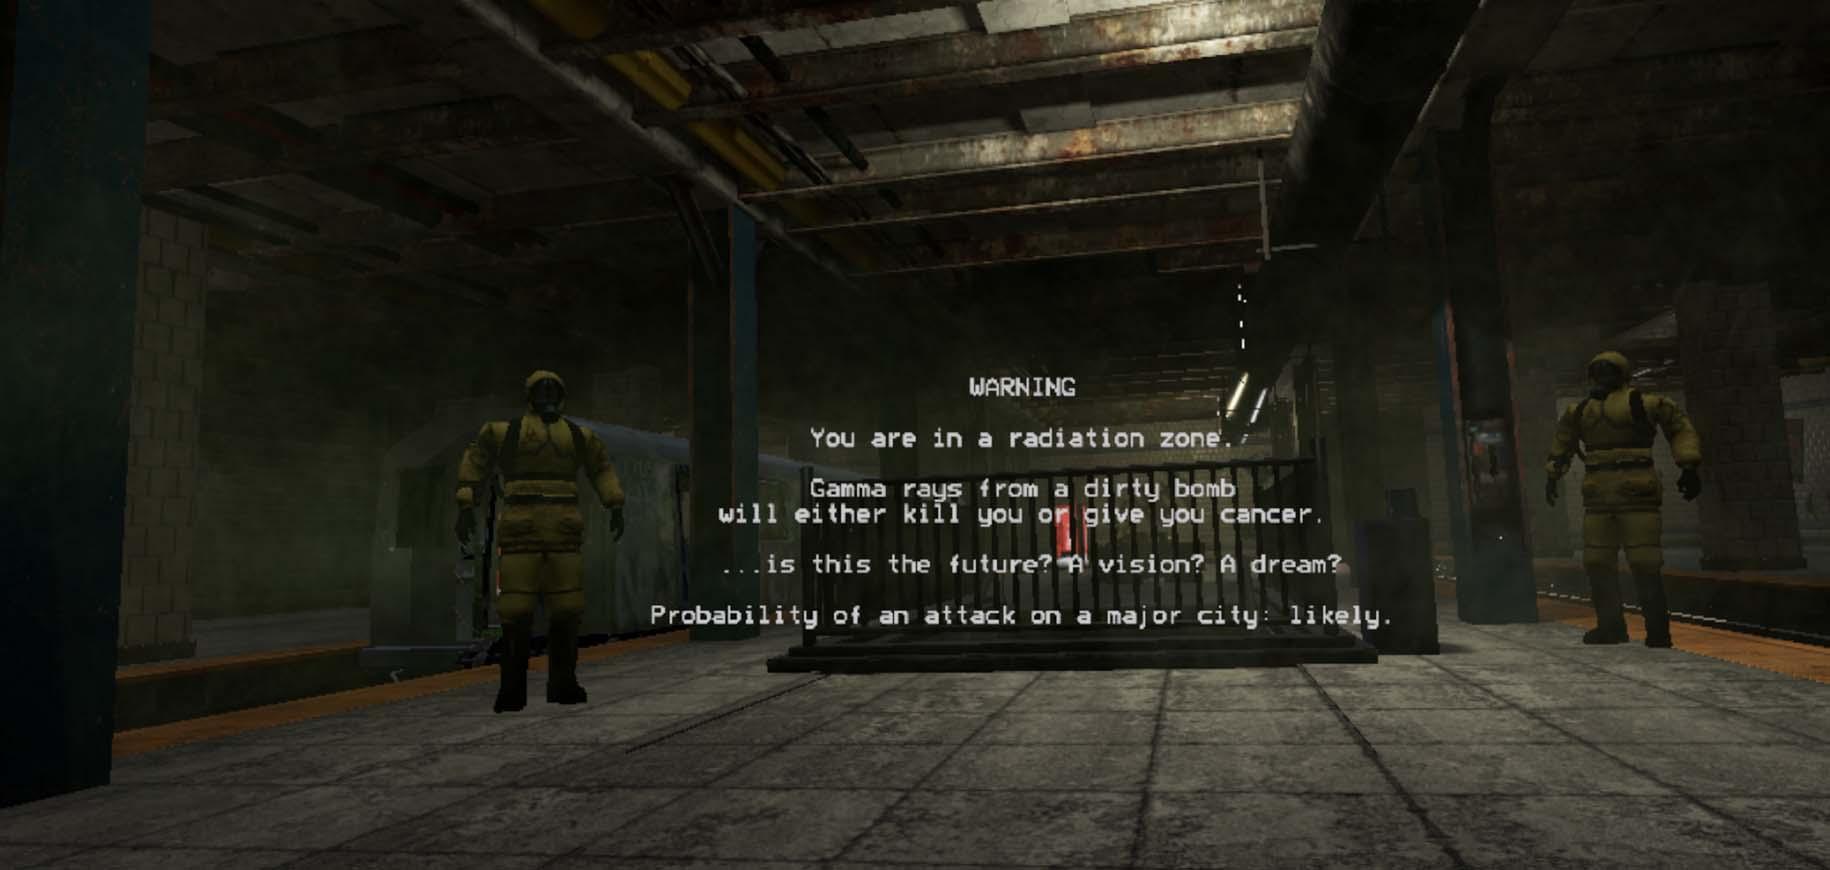 Scene 1: Subway